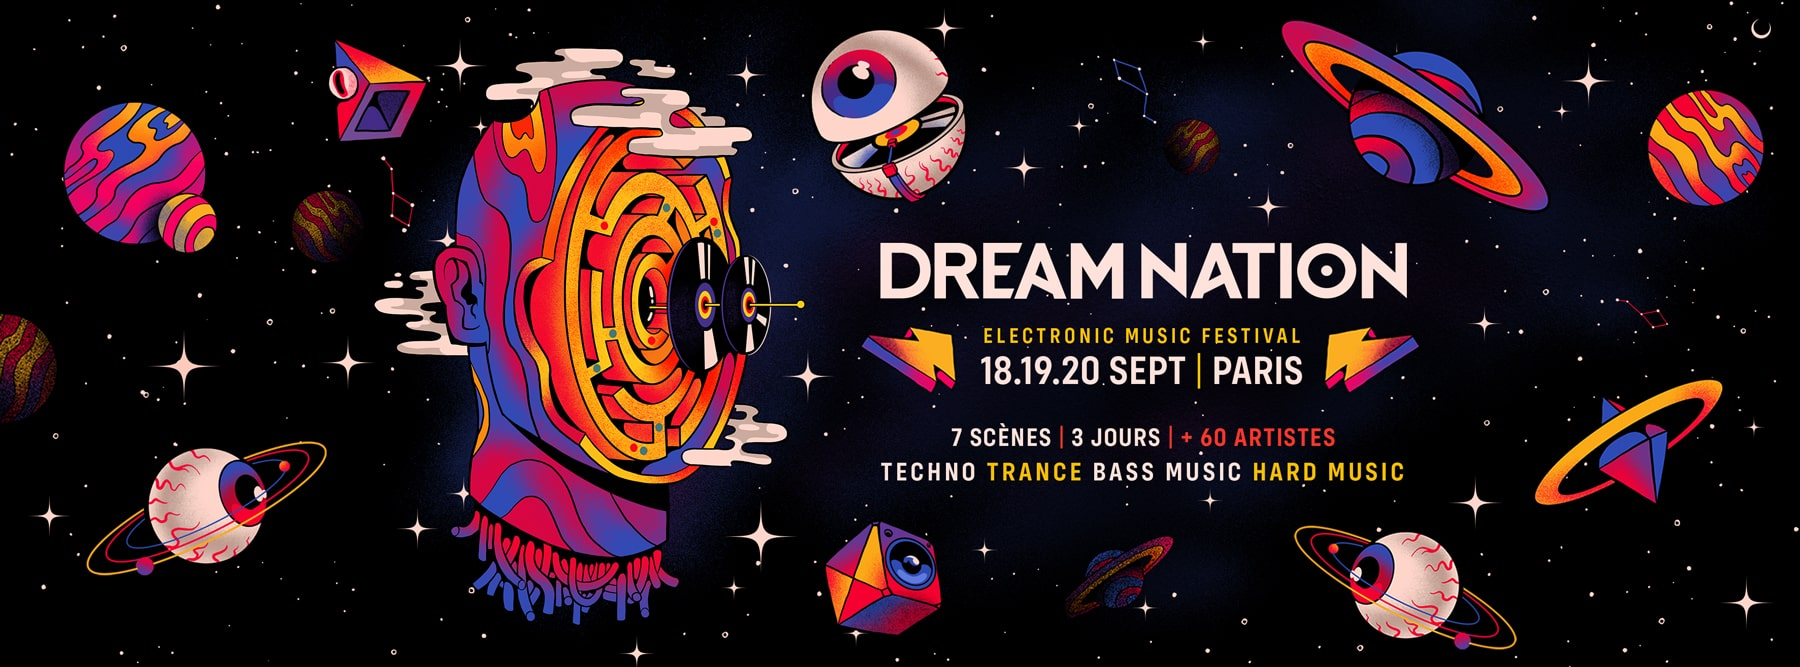 Dream Nation festival programmation